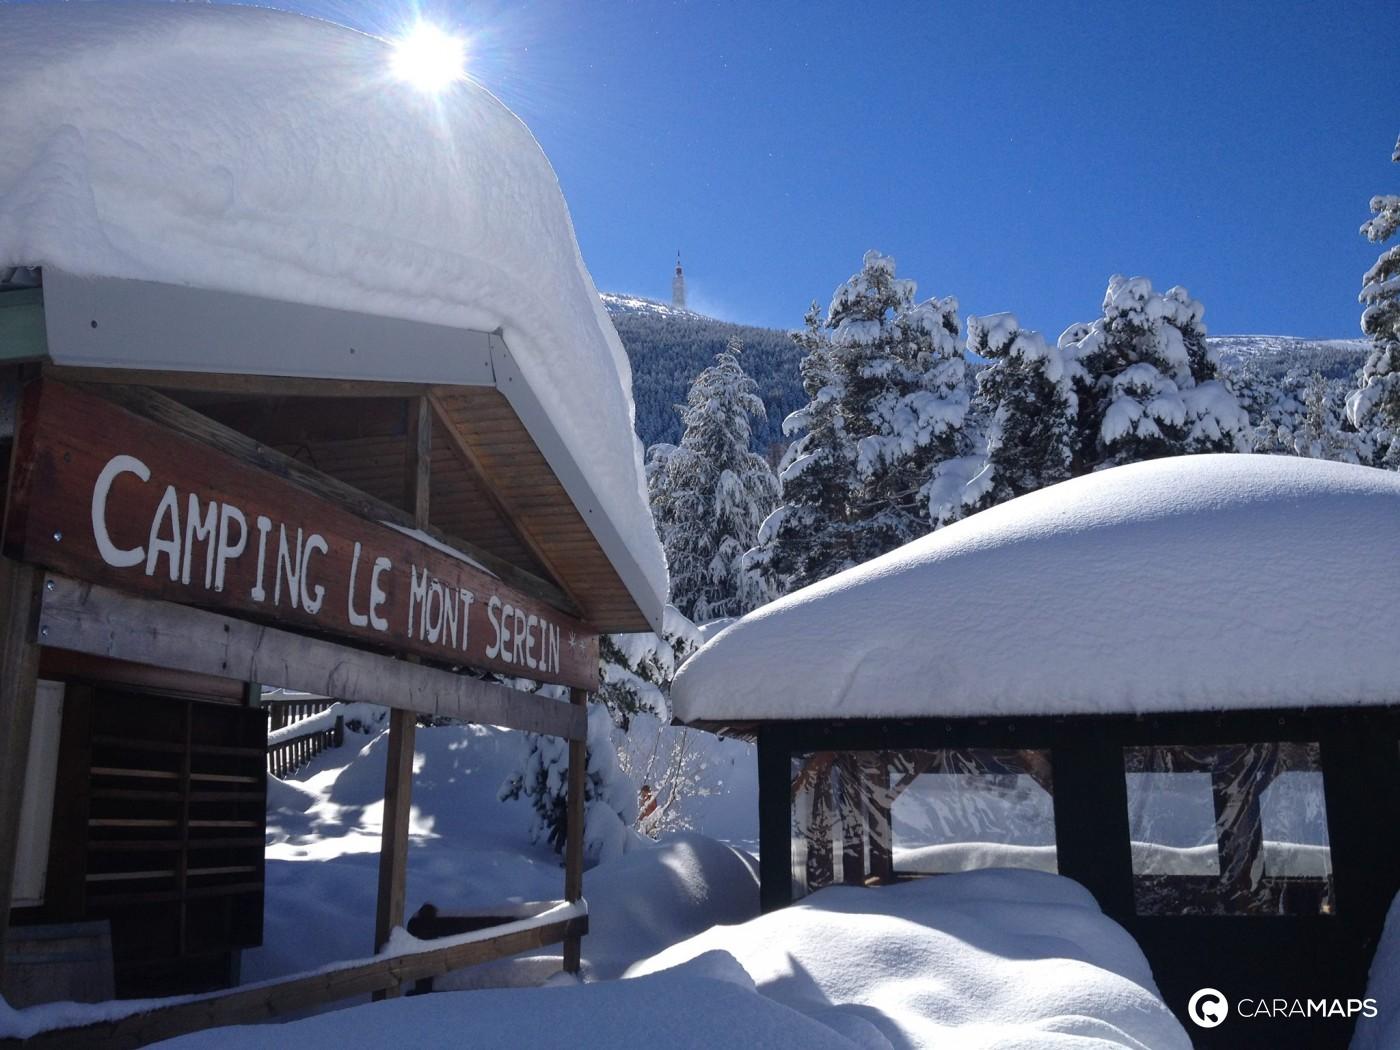 Mont Serein Camping Car